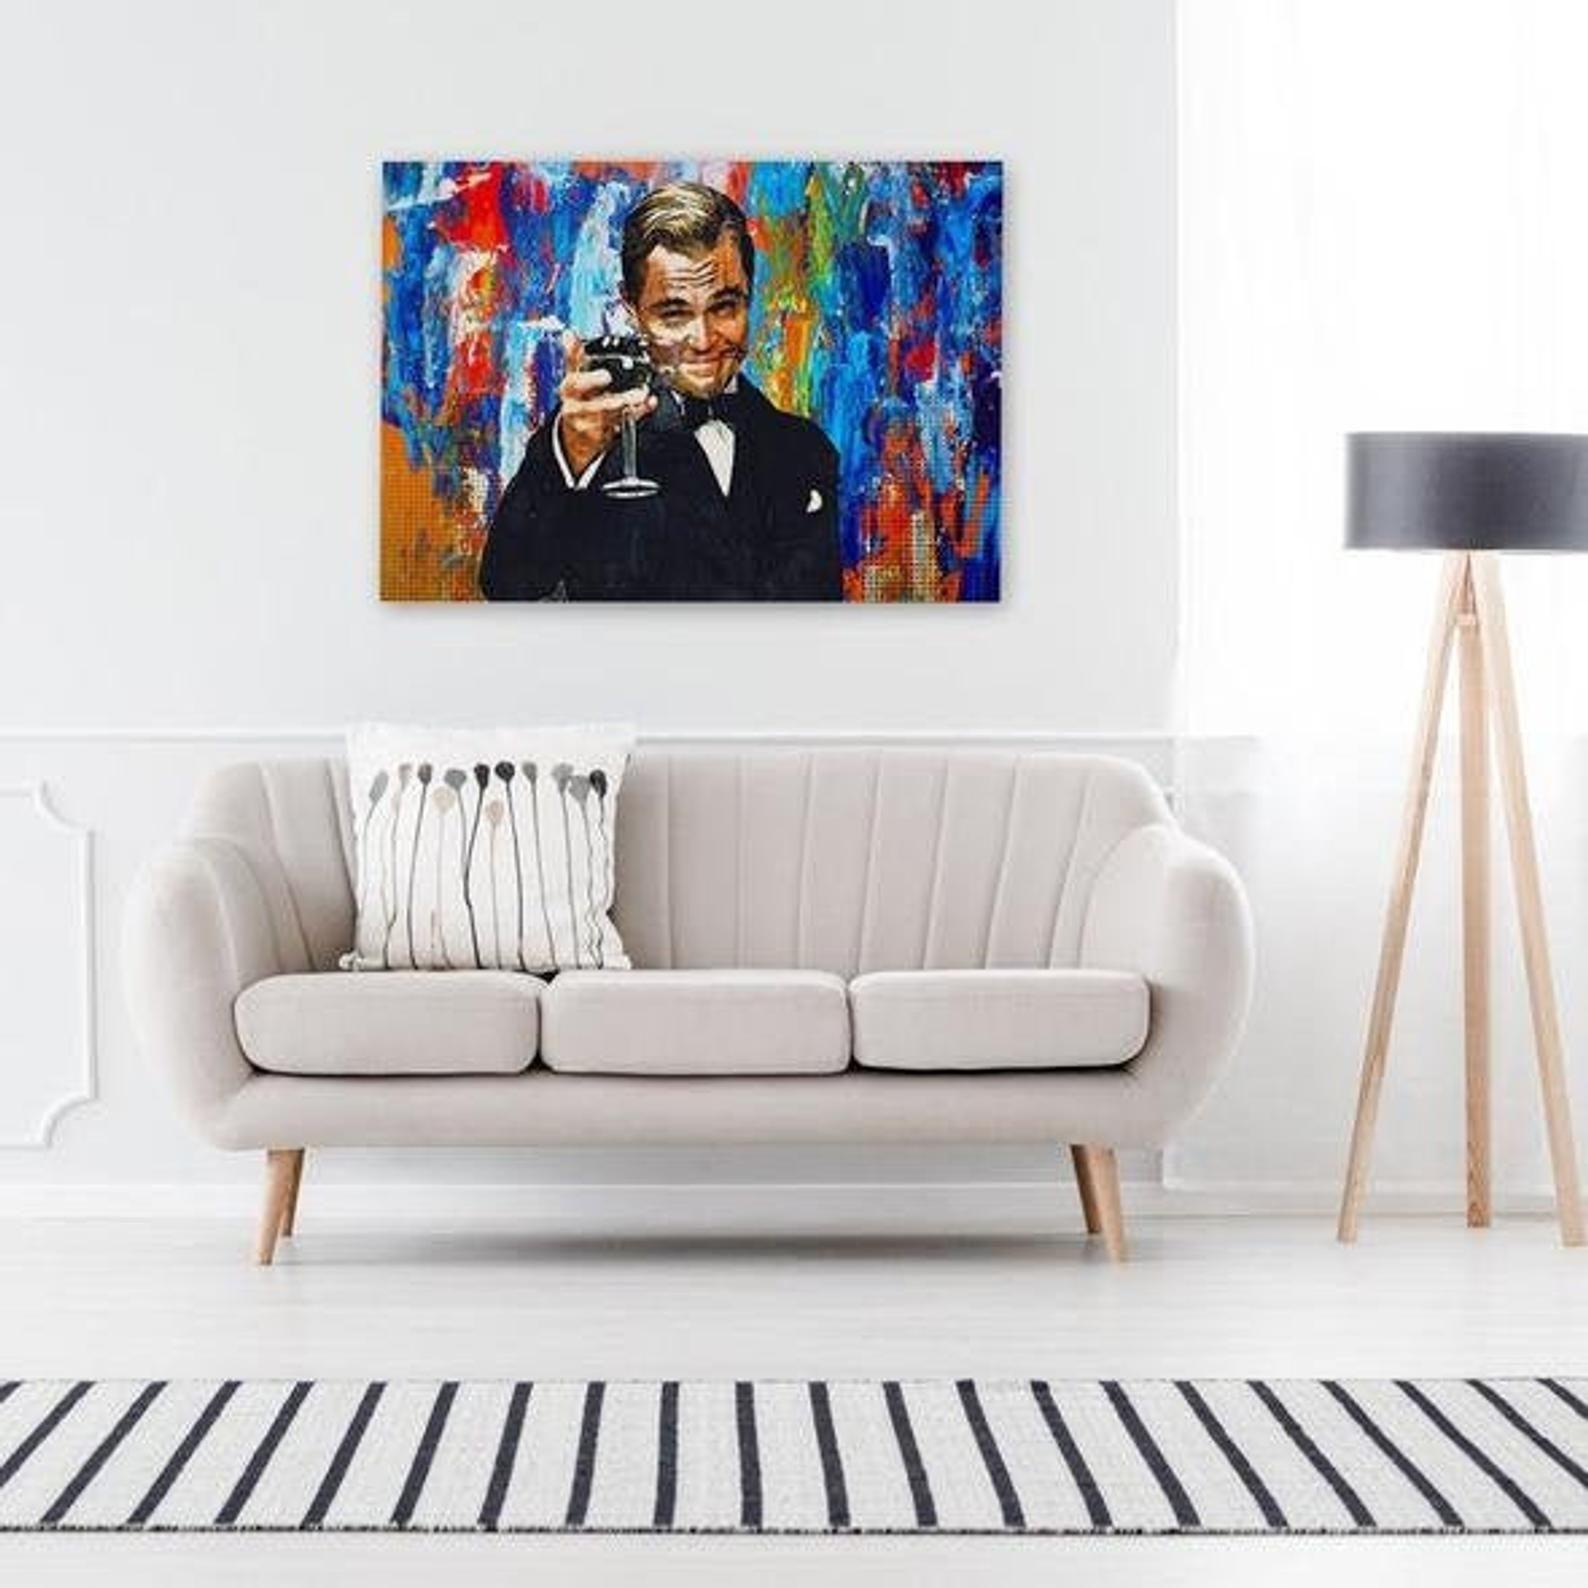 Gatsby Celebrate Success Wolf Of Wall Street Canvas Wolf Of Wall Street Poster Leonardo Dicaprio Wall Art Perfect Office Decor Shop Wall Art Oversized Canvas Art Inspirational Wall Art